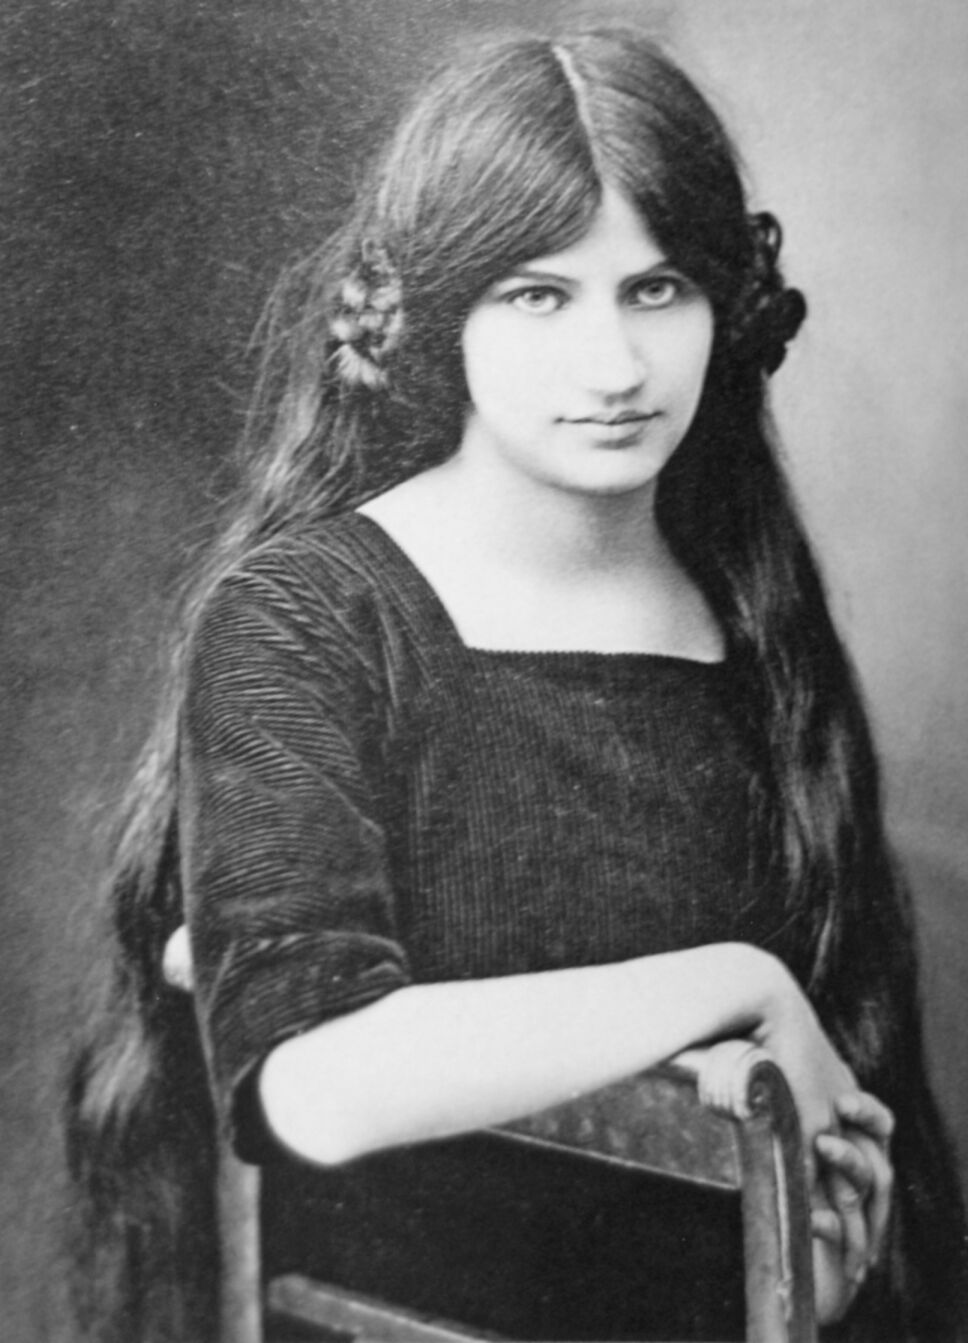 Jeanne-hebuterne-at-19-years-Amedeo-modiglian.jpg